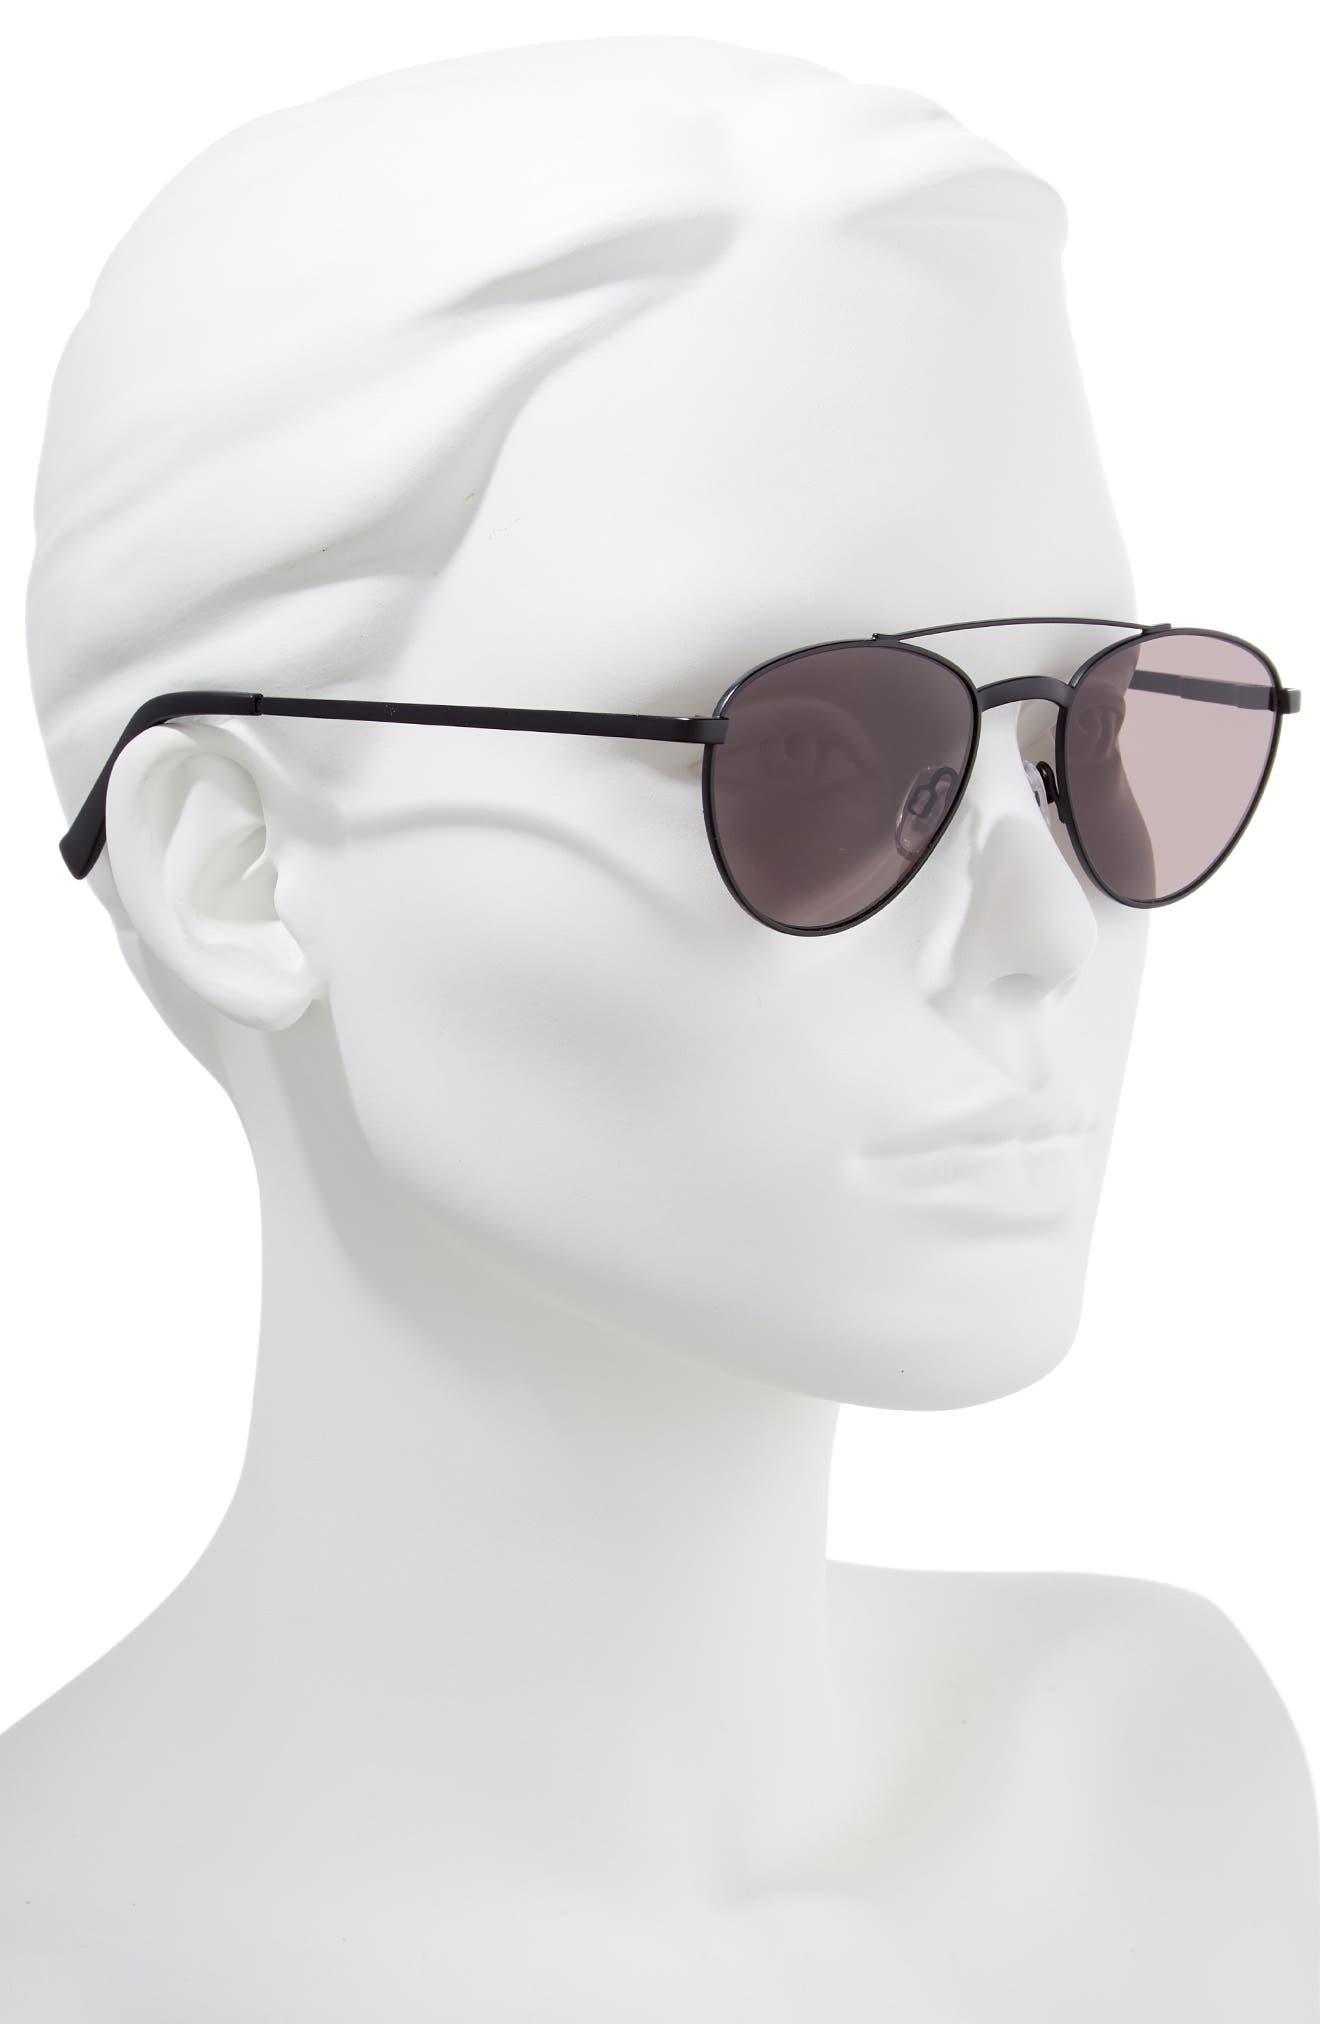 Rocket Man 52mm Aviator Sunglasses,                             Alternate thumbnail 2, color,                             MATTE BLACK